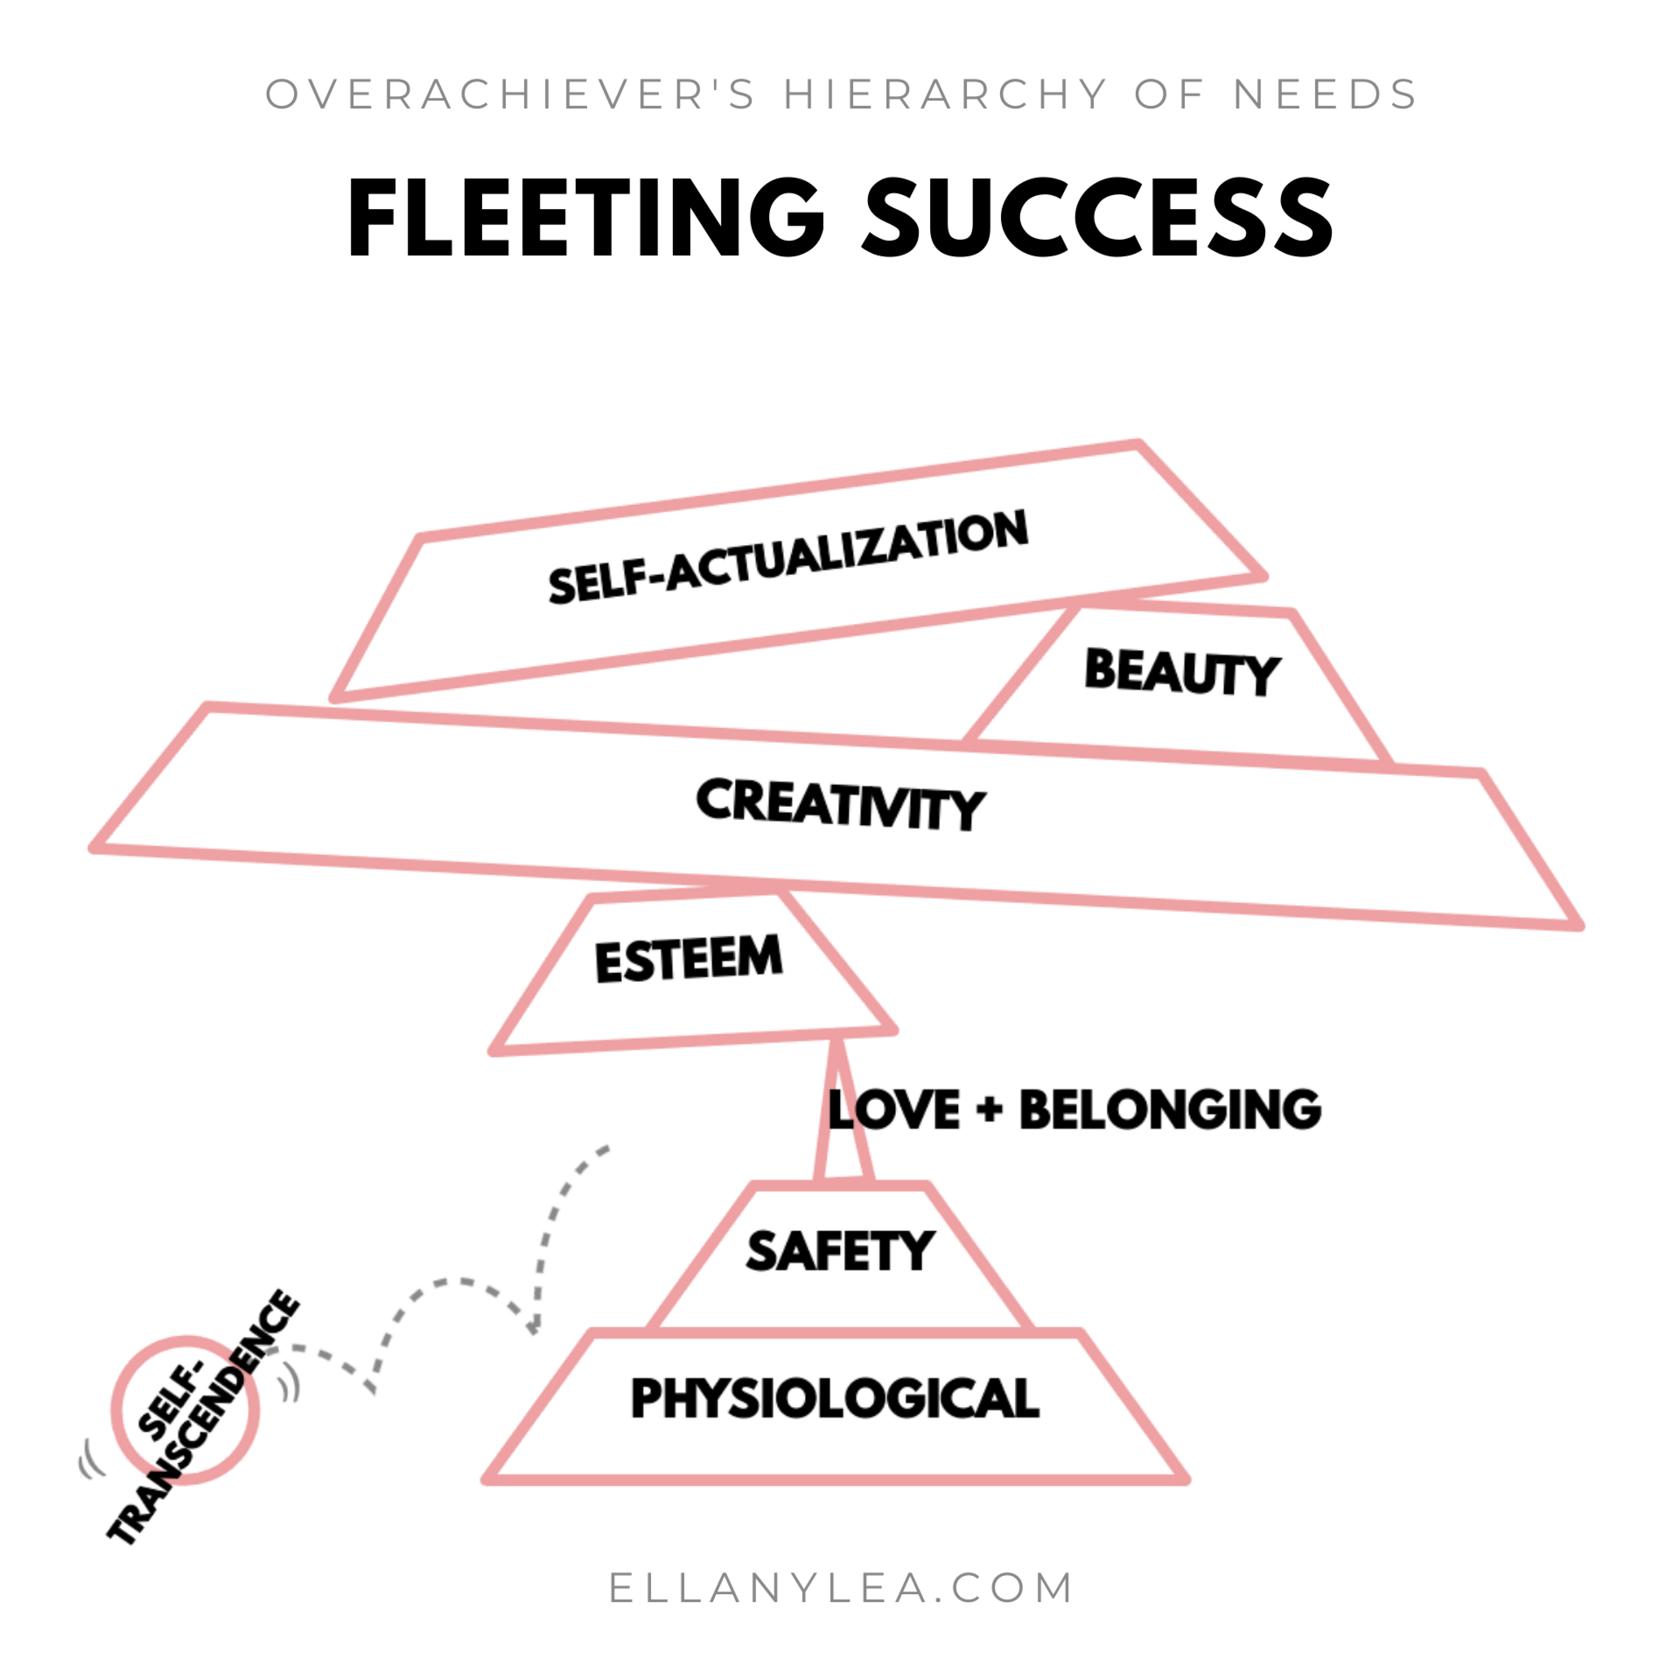 EL - Overachievers Hierarchy of Needs - Success Fleeting